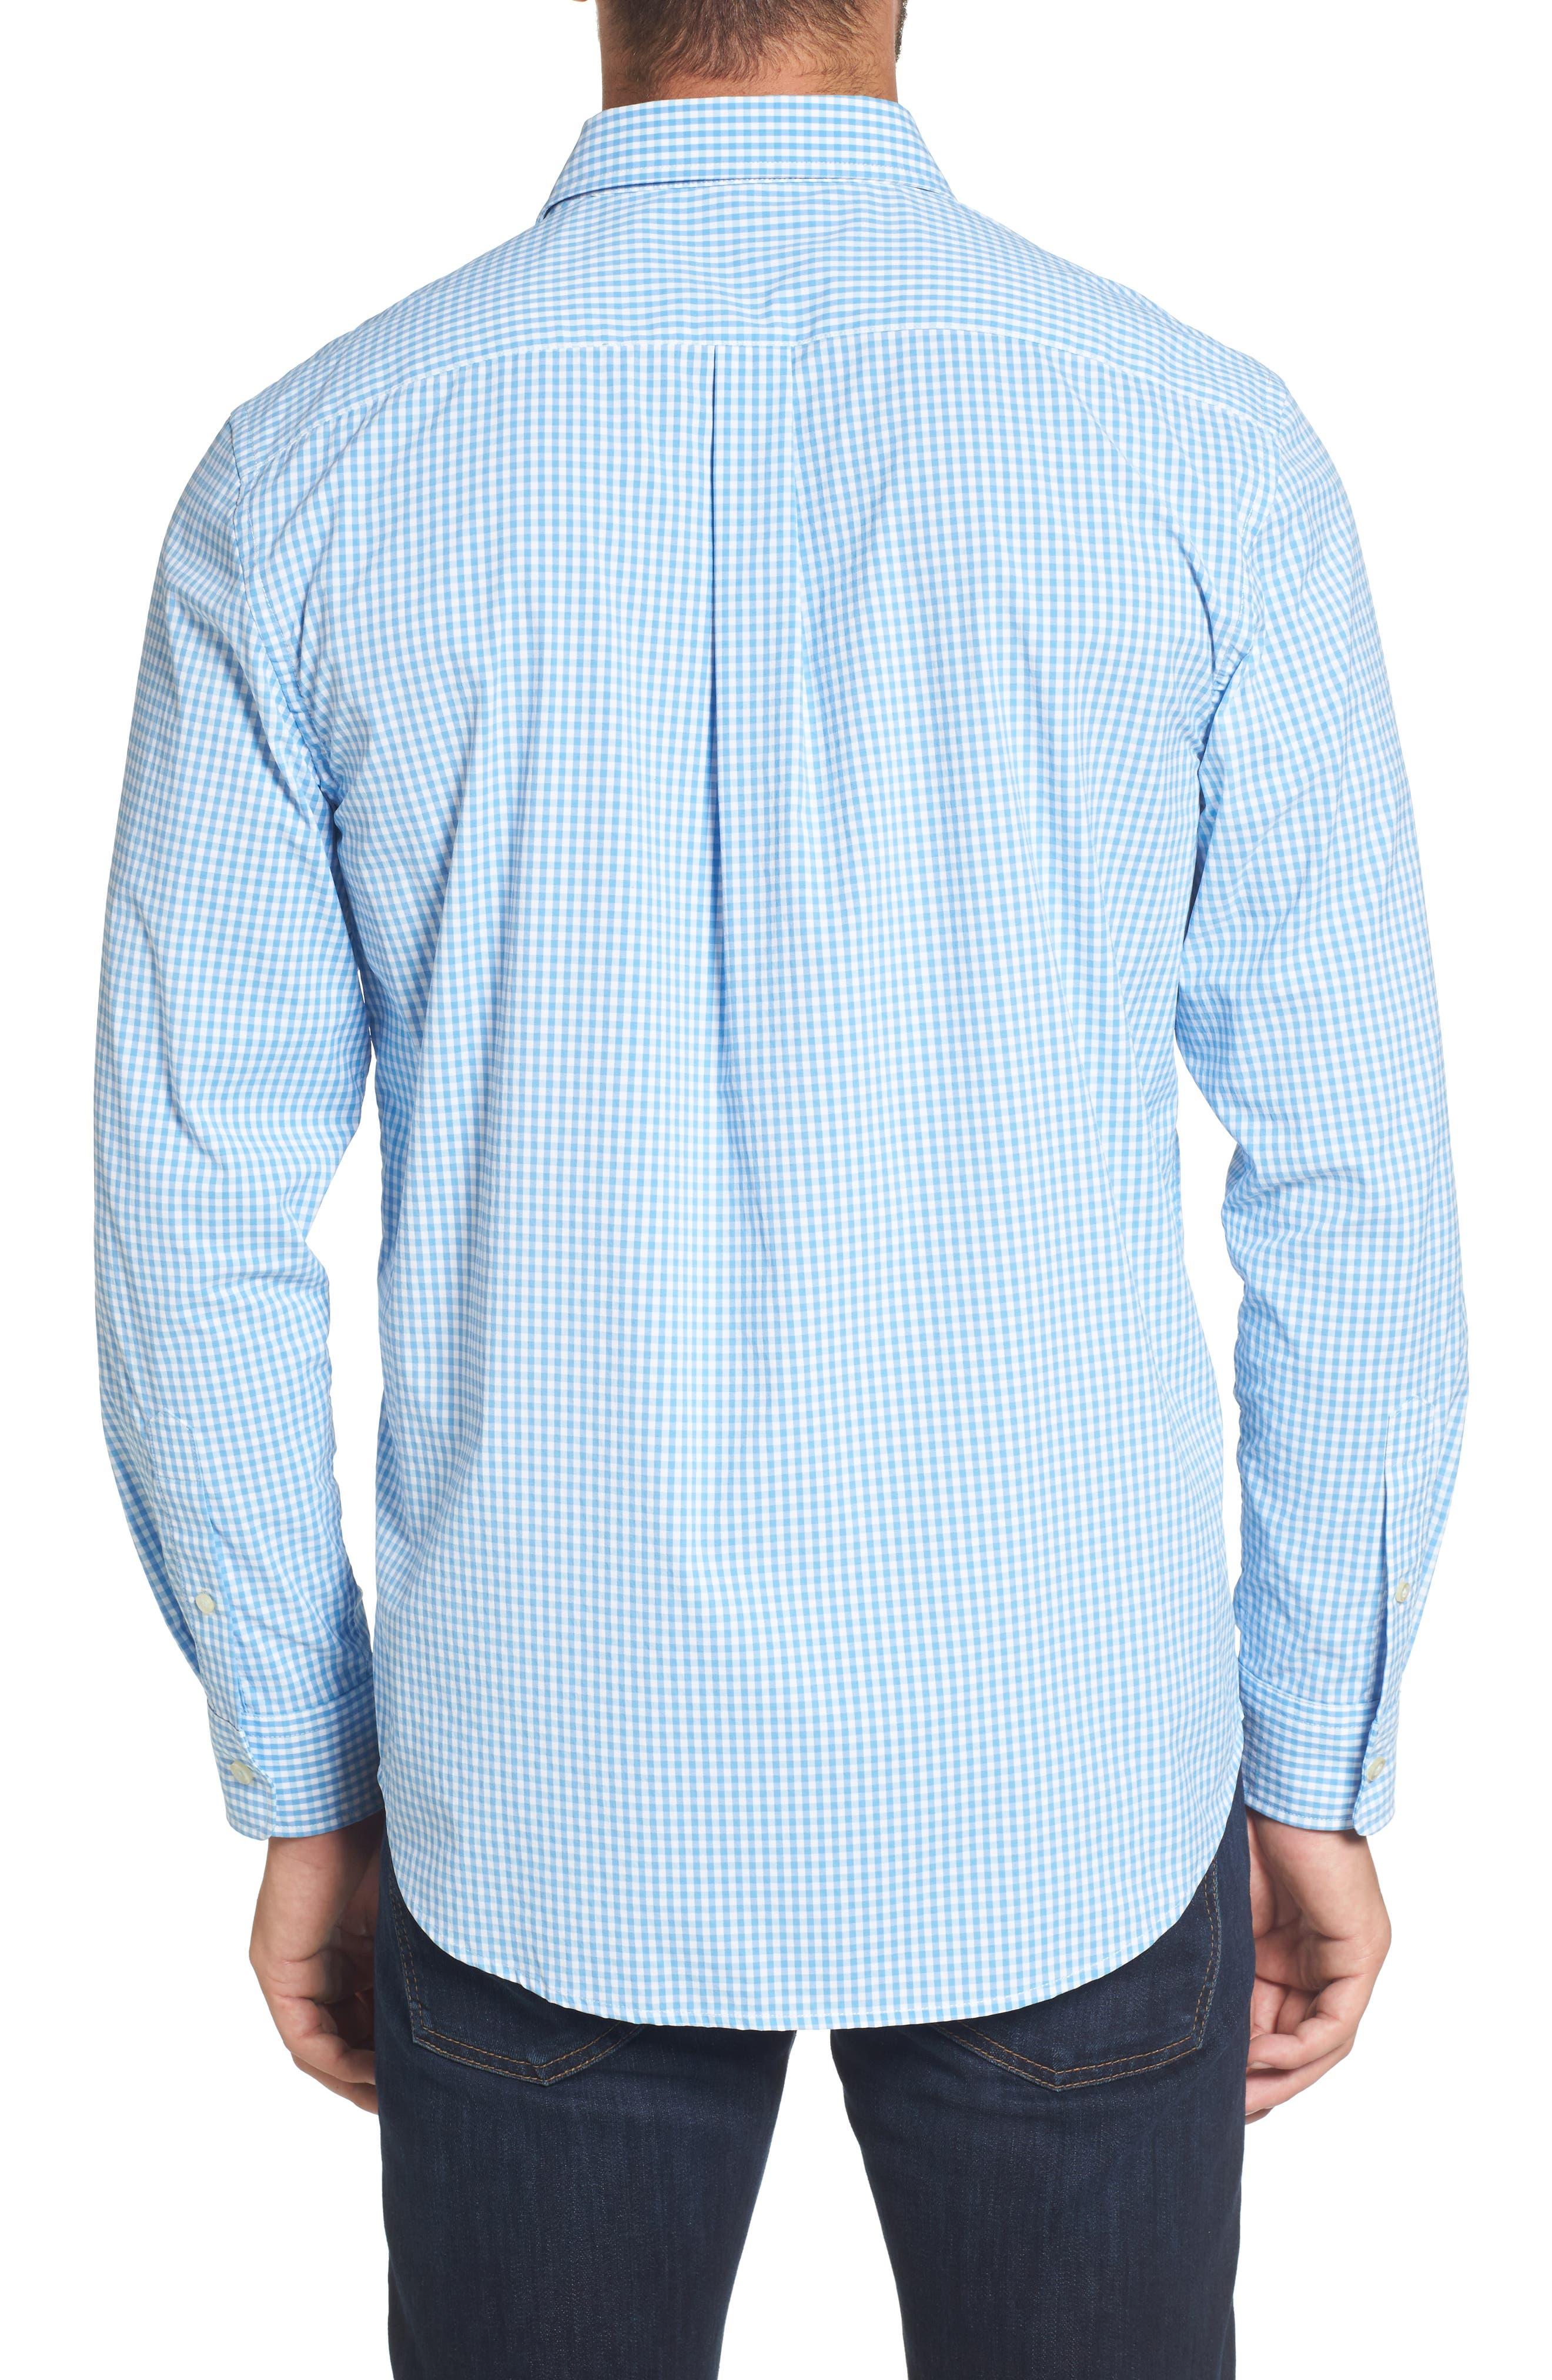 Seawater Gingham Performance Sport Shirt,                             Alternate thumbnail 2, color,                             Hull Blue